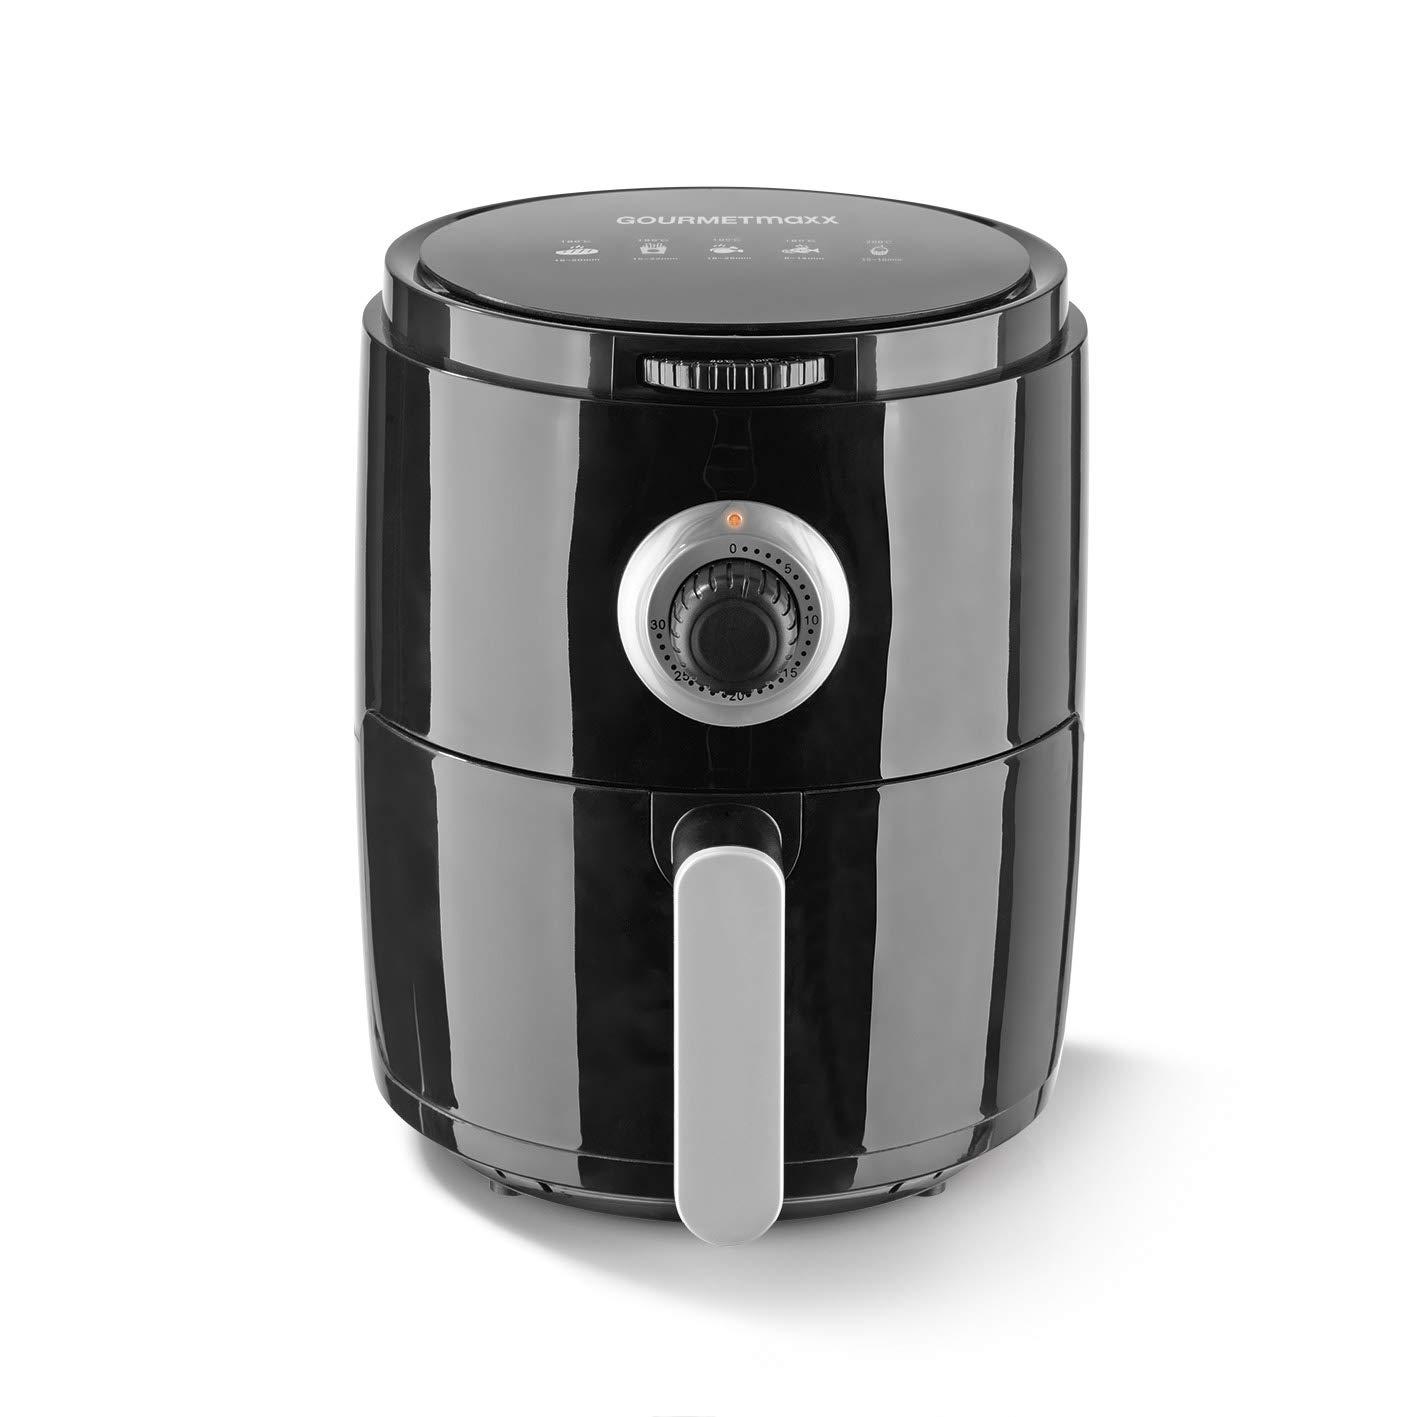 Freidora de aire caliente Gourmet Maxx 8 in1 1500 W color ...